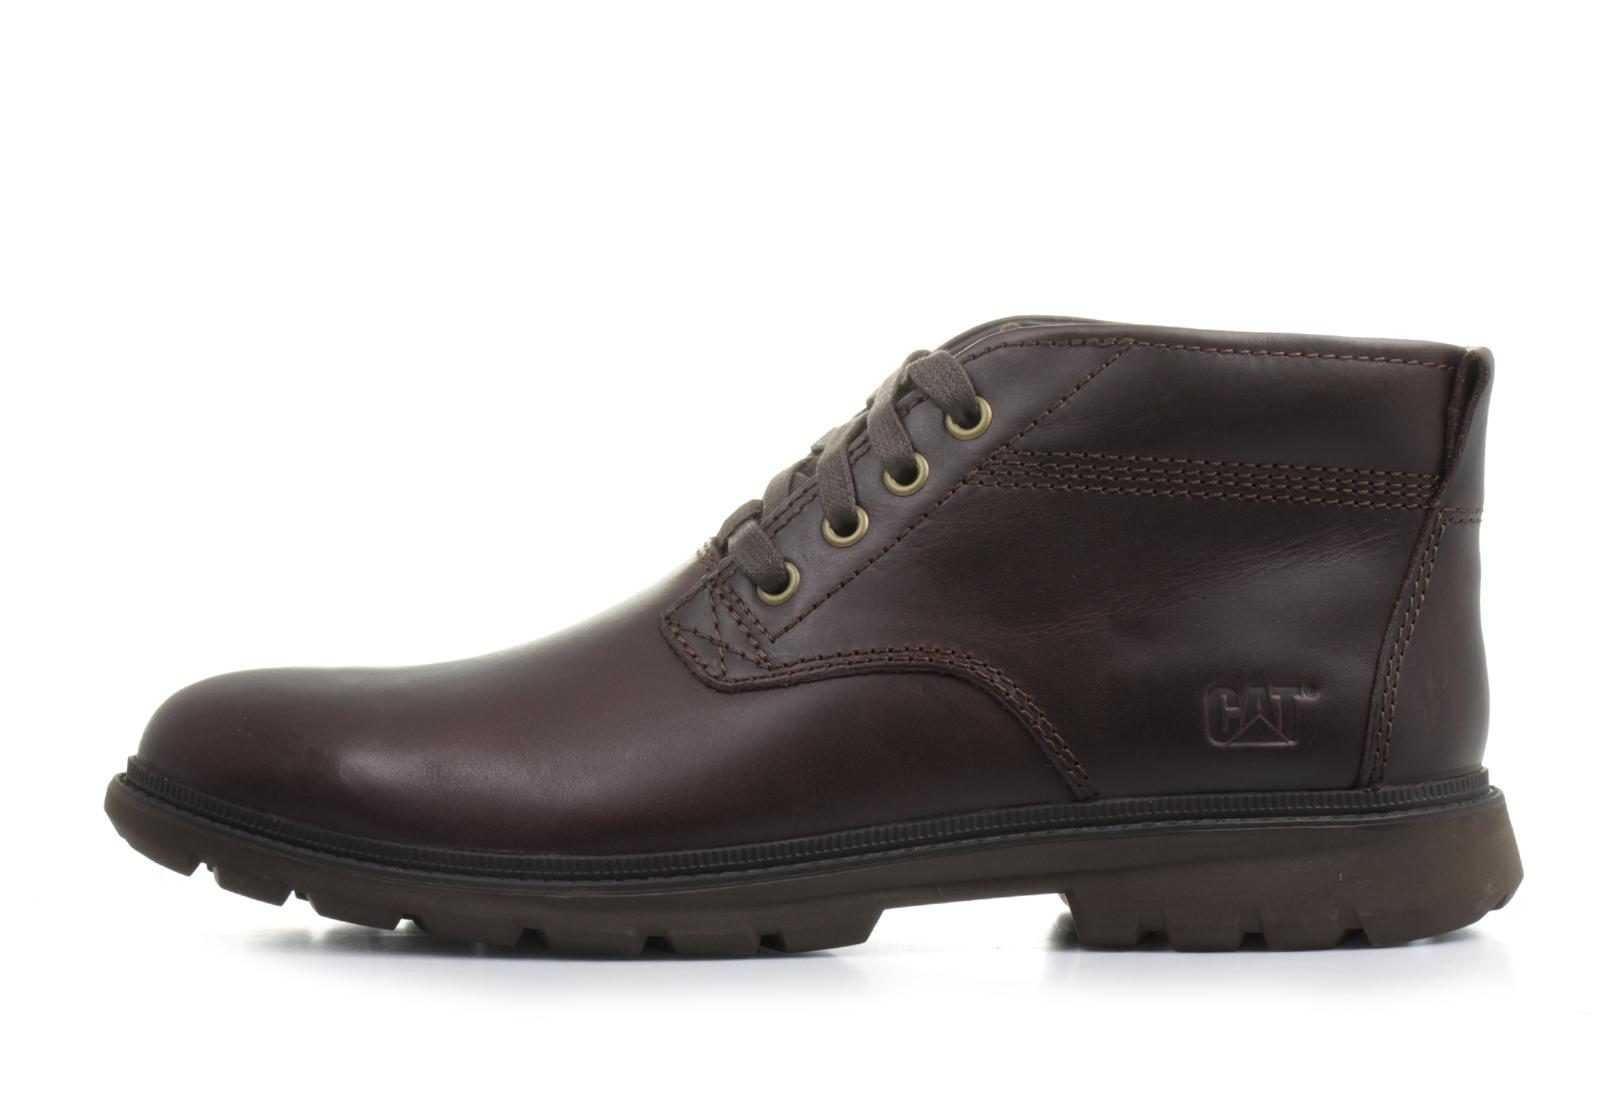 cat boots trenton 721802 cof shop for